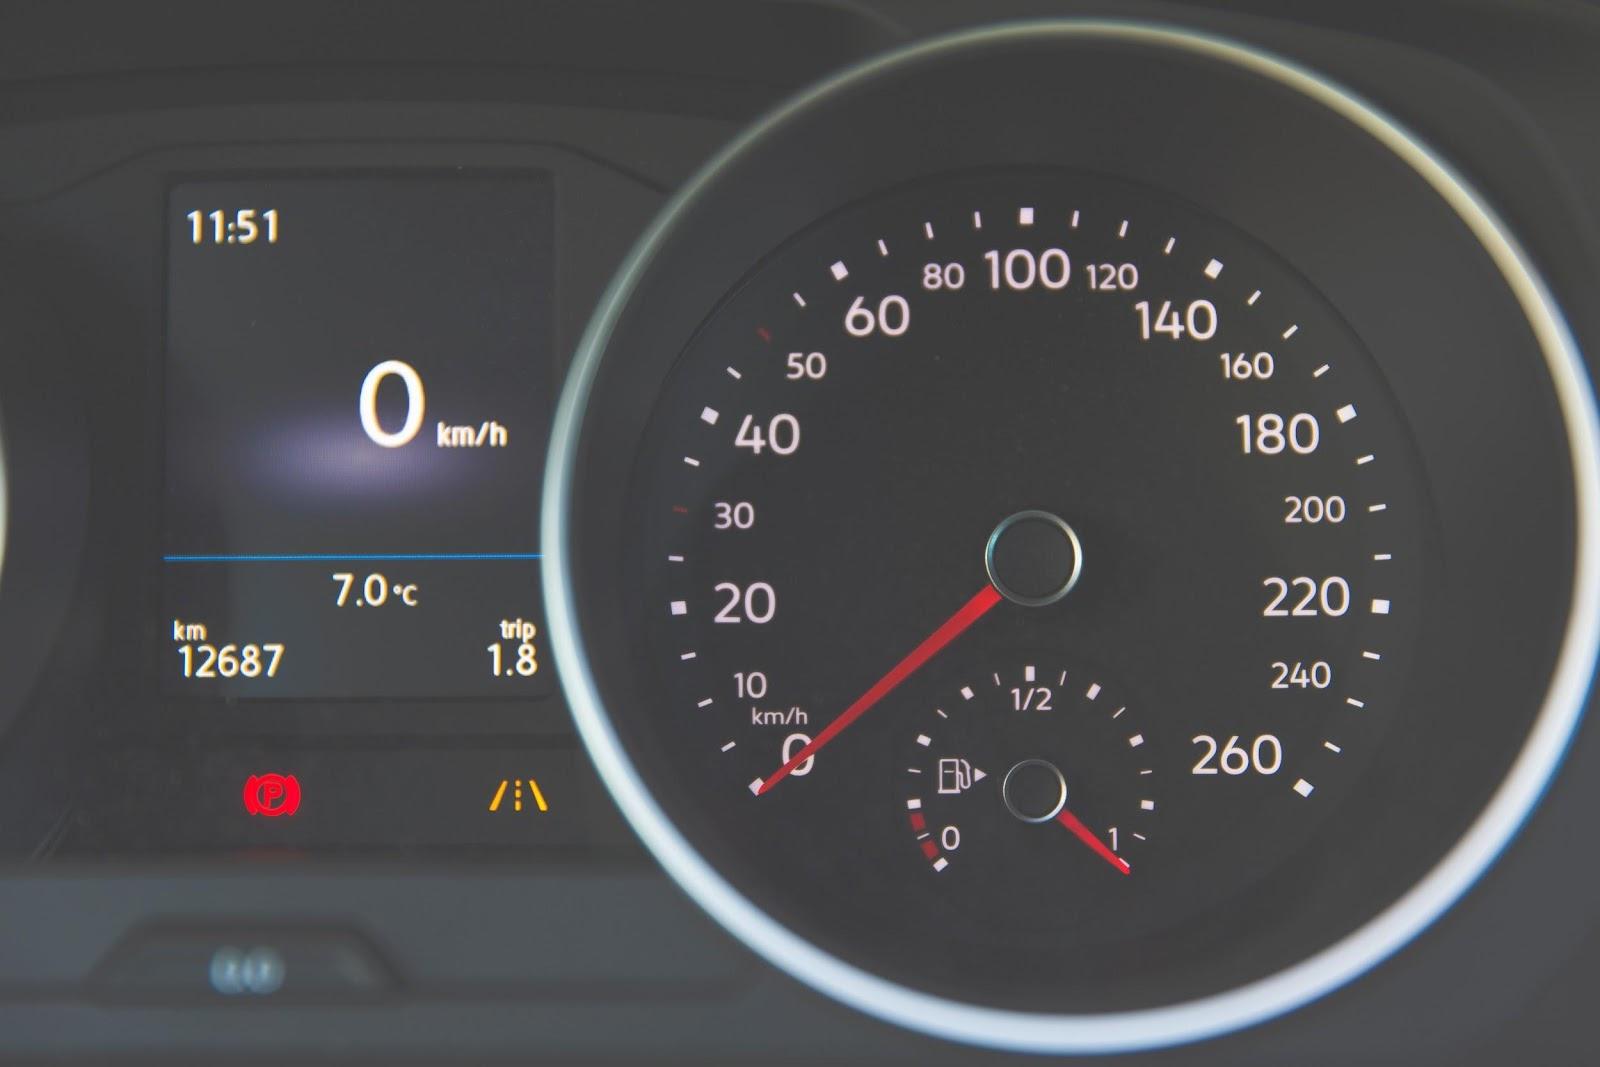 Buy a more fuel-efficient vehicle